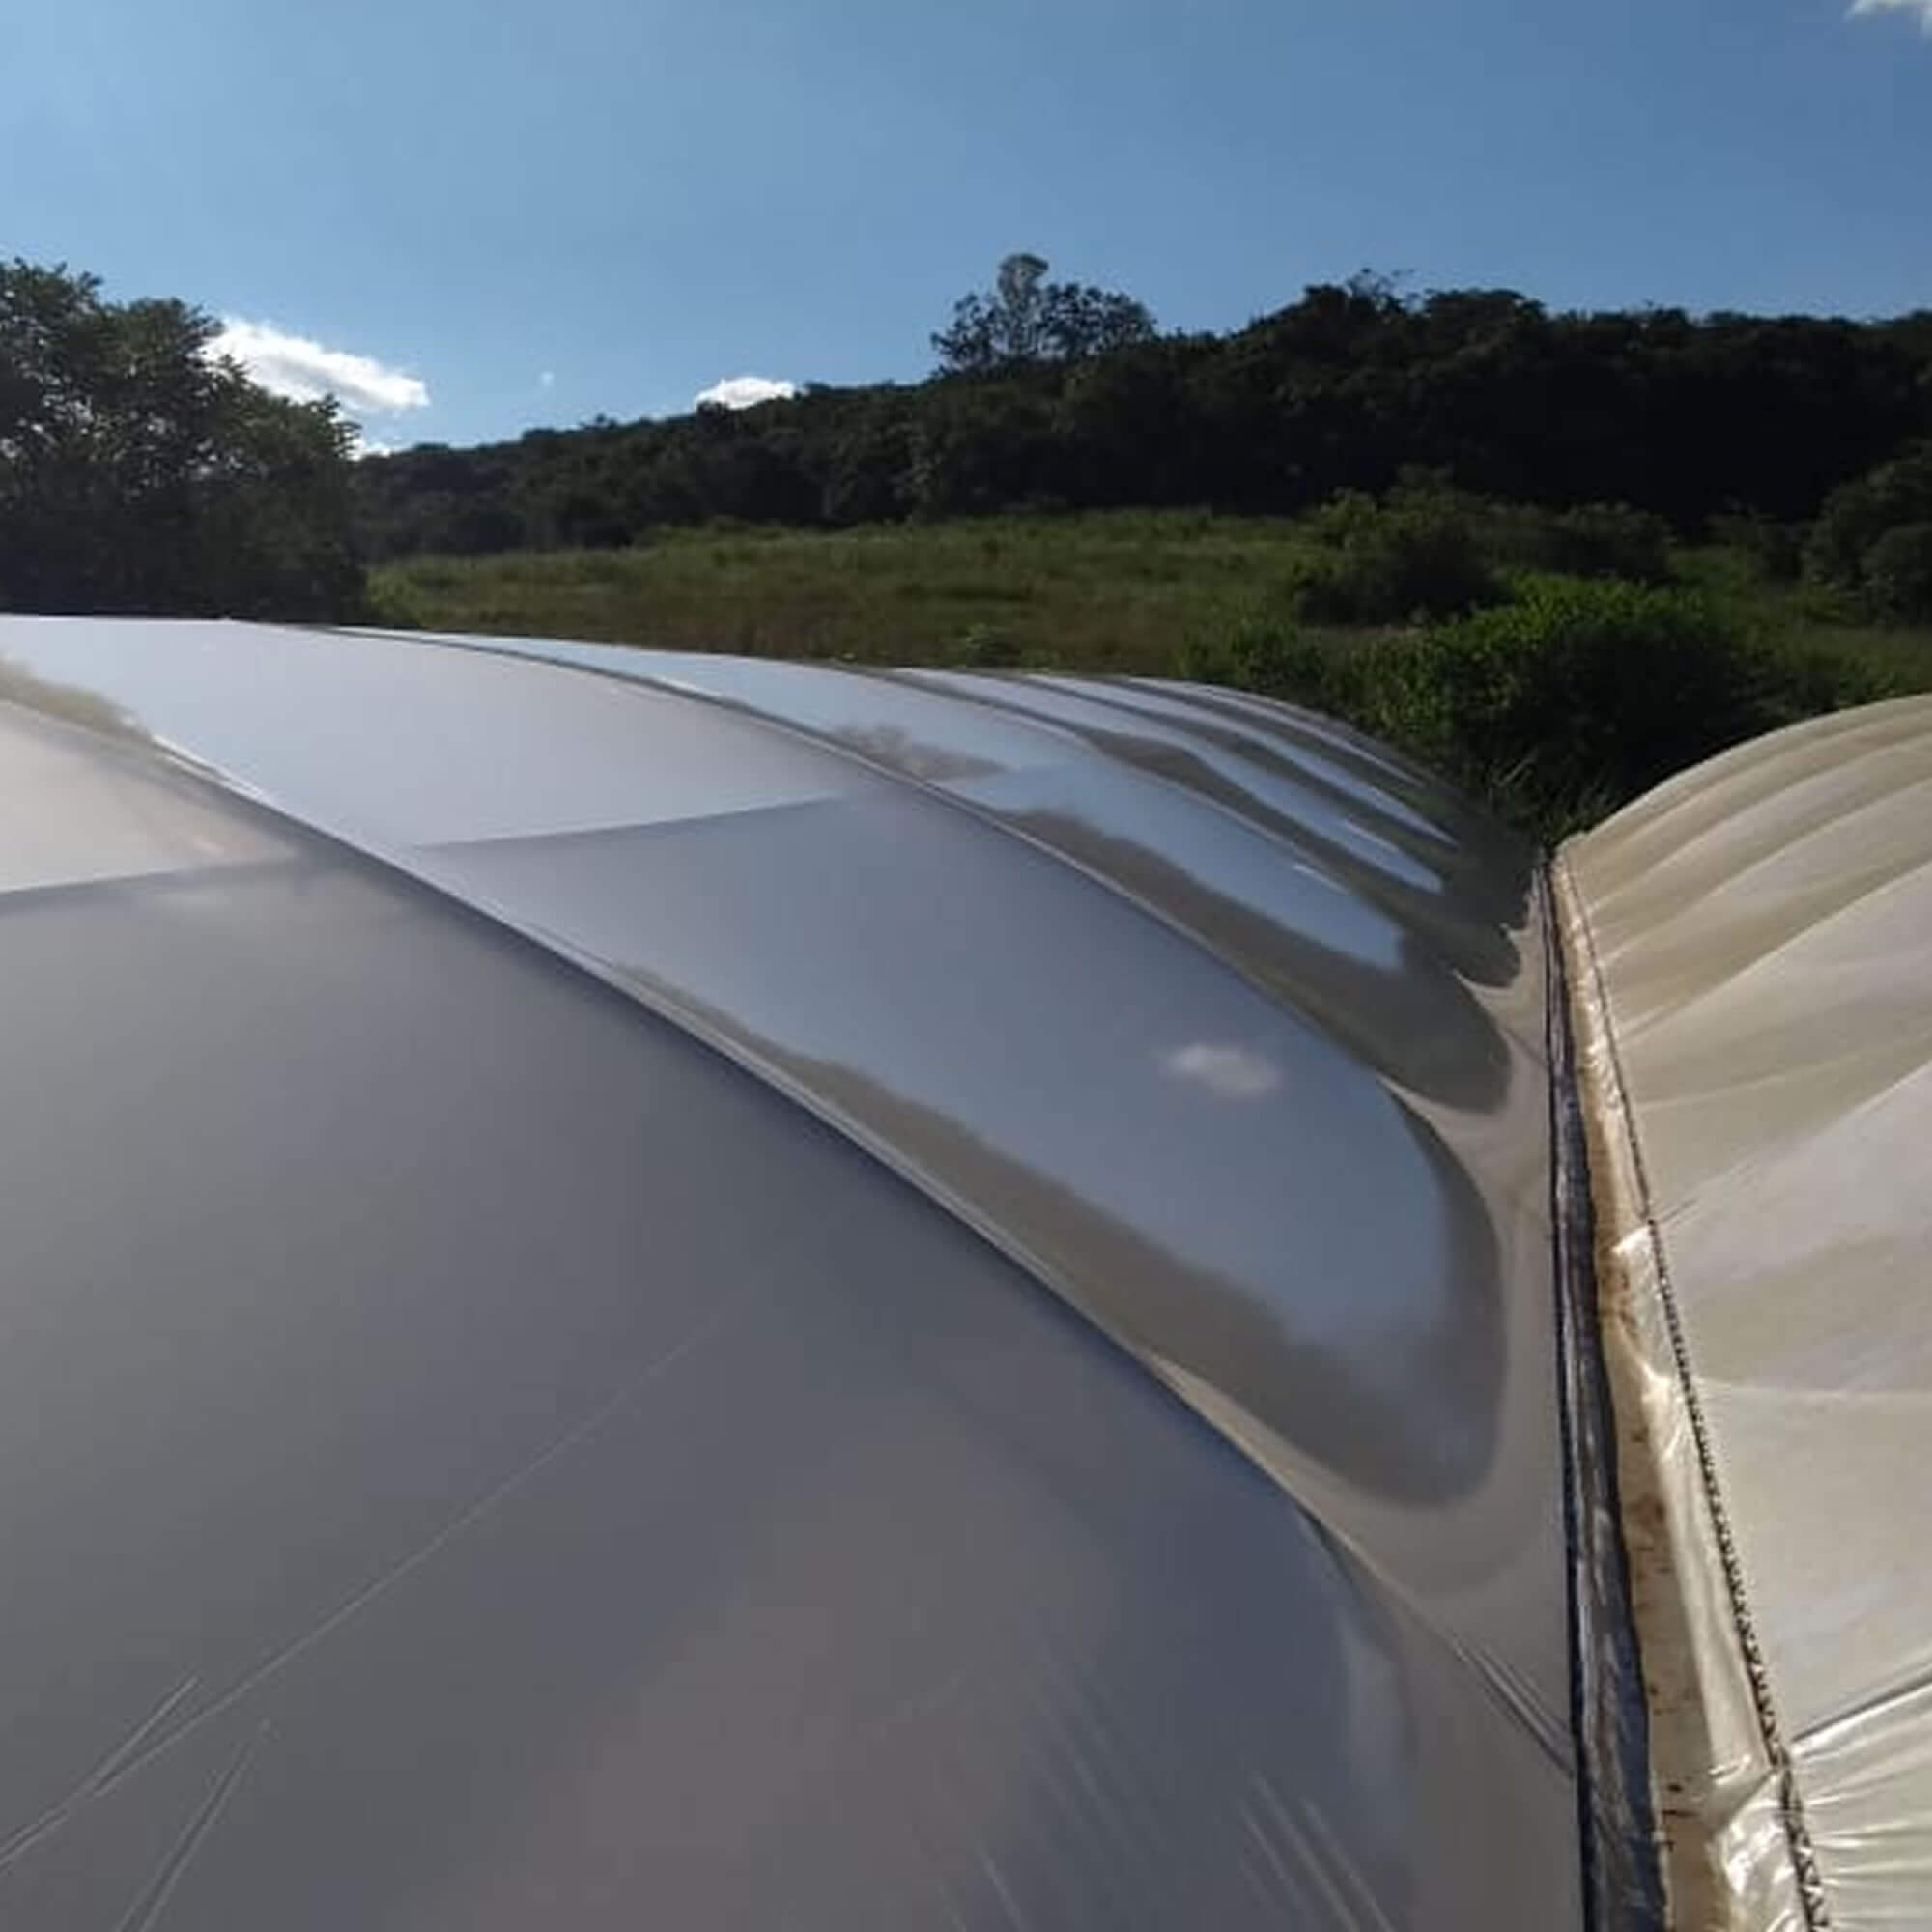 Filme Plástico Difusor para Estufa - 8 x 10 metros - 120 micras - Politiv